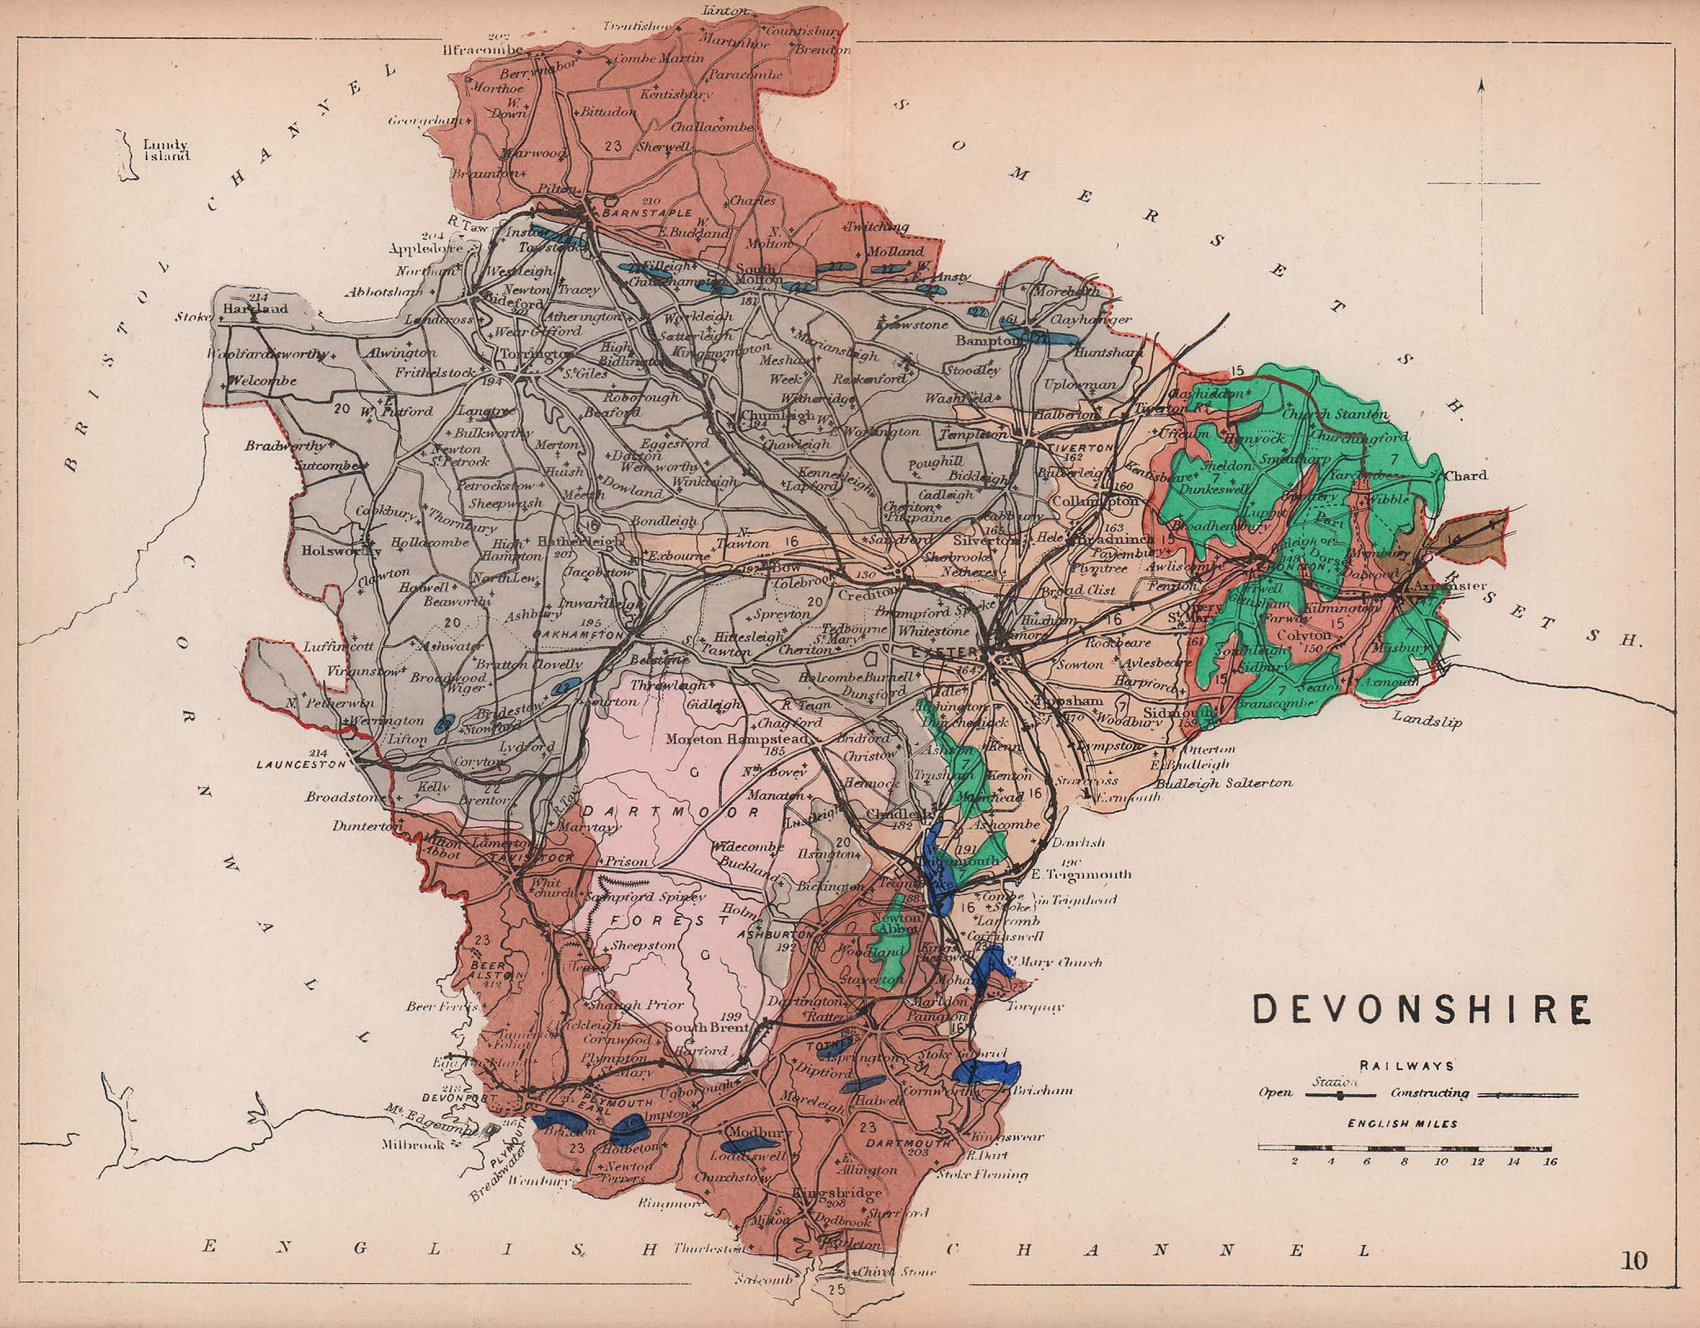 DEVON. Devonshire antique geological county map by James Reynolds 1864